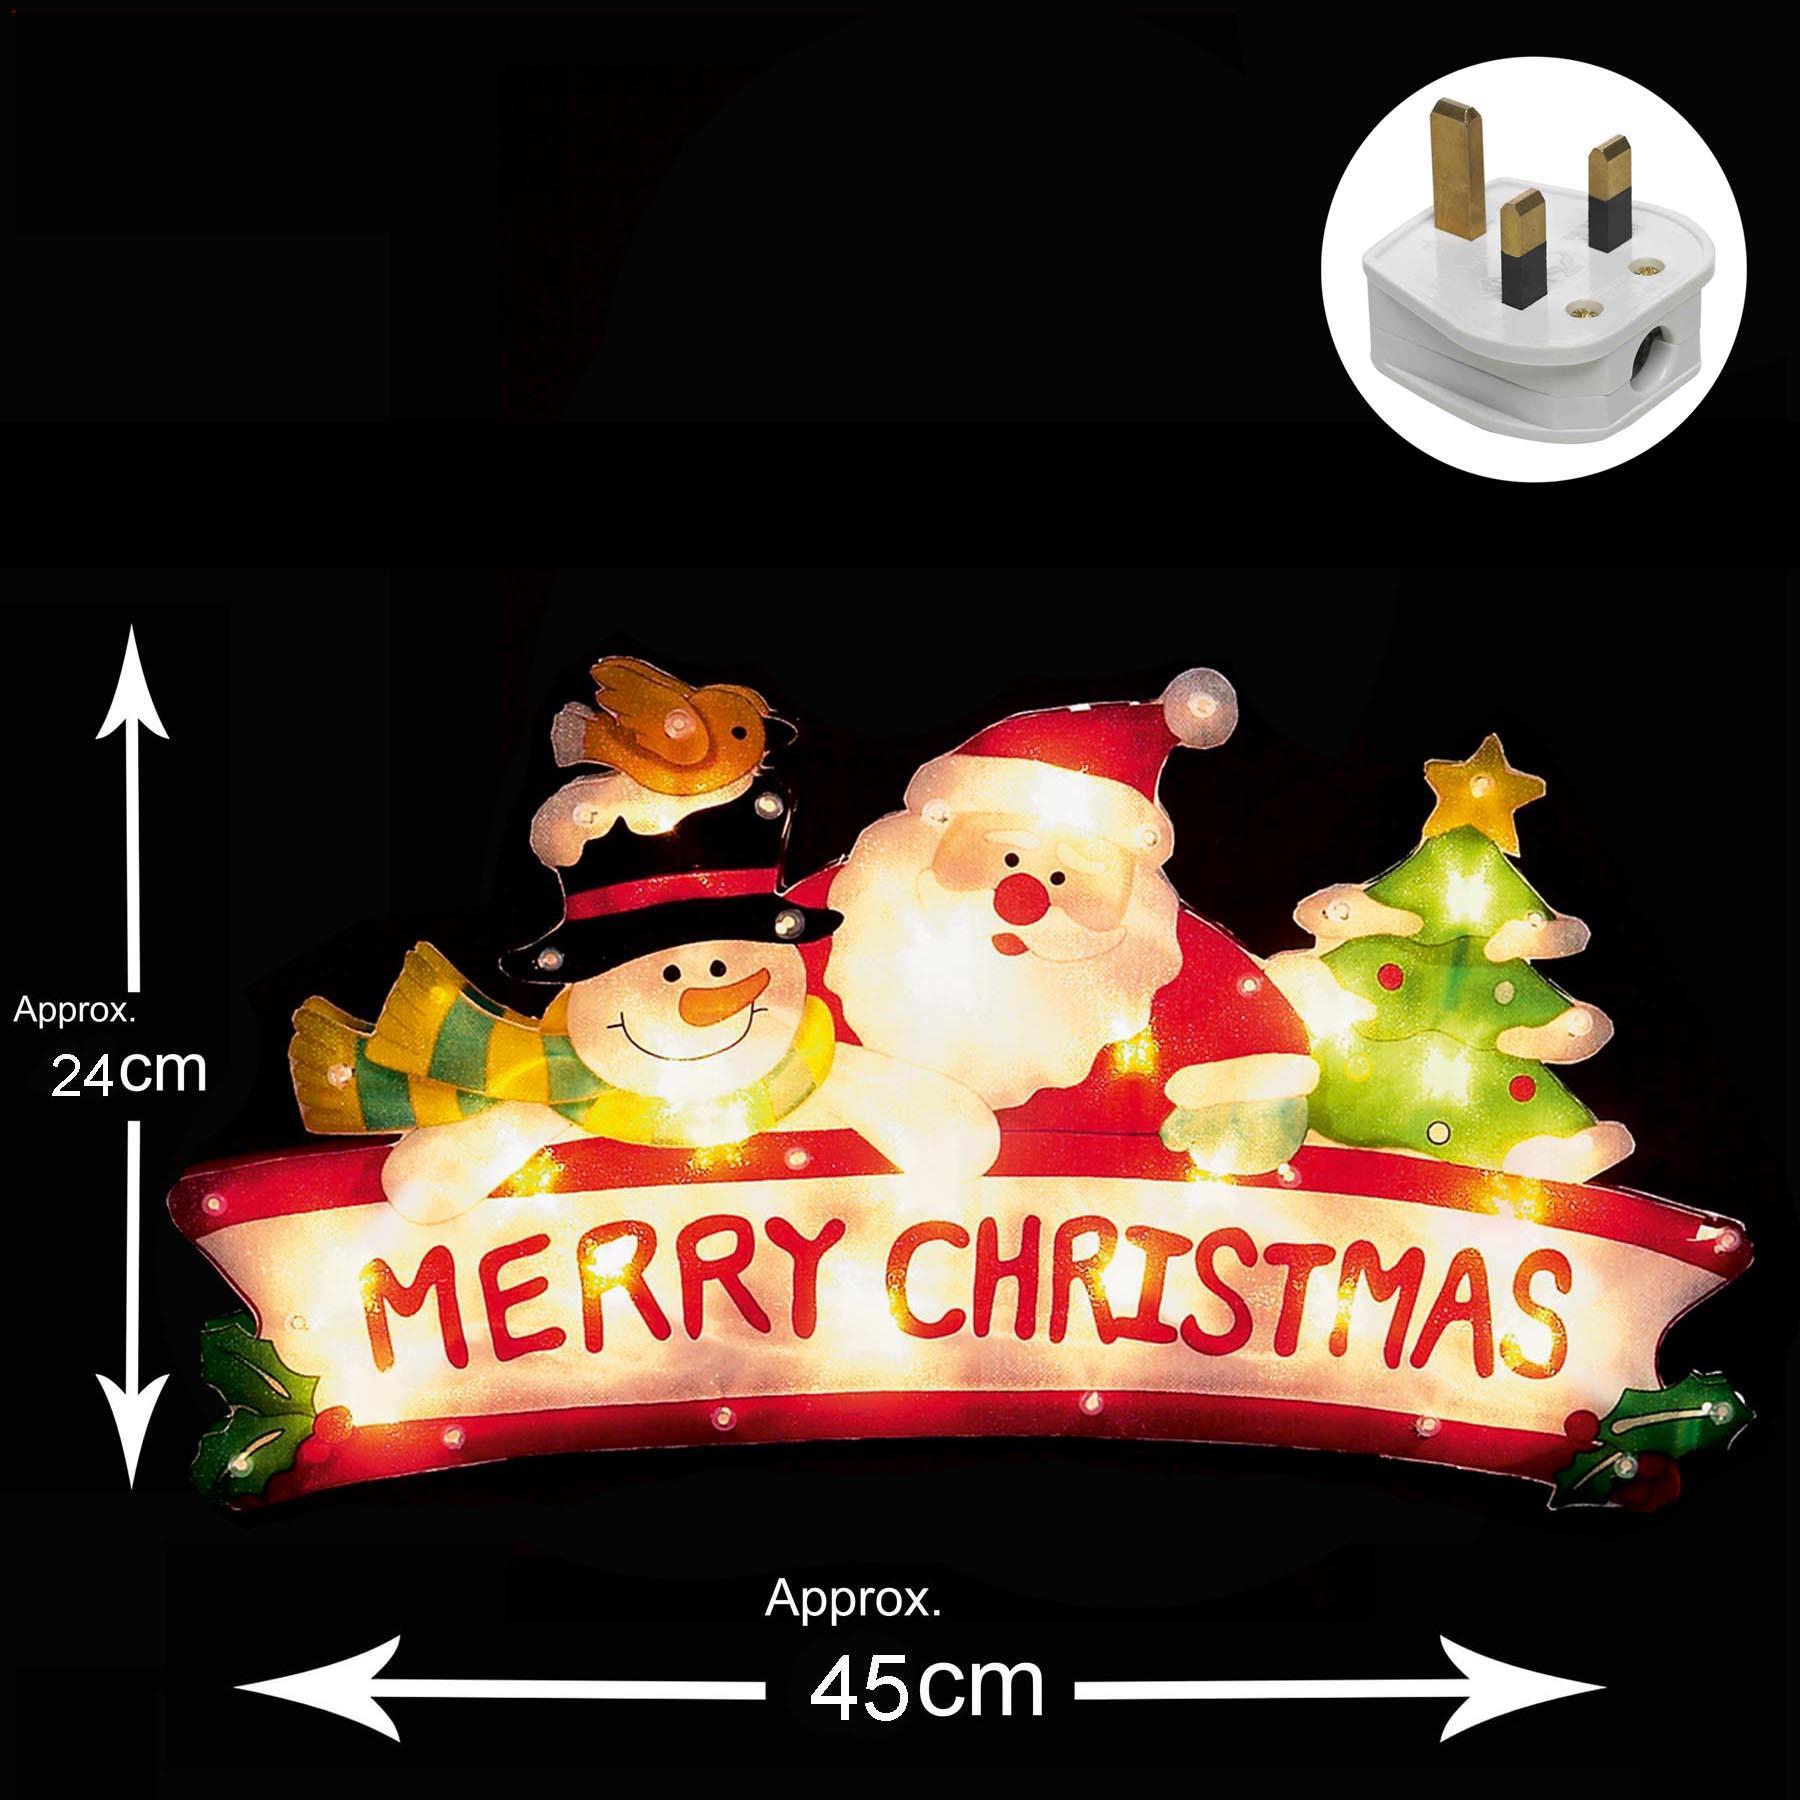 Premier Light Up INDOOR Christmas Window Silhouette - Merry ...